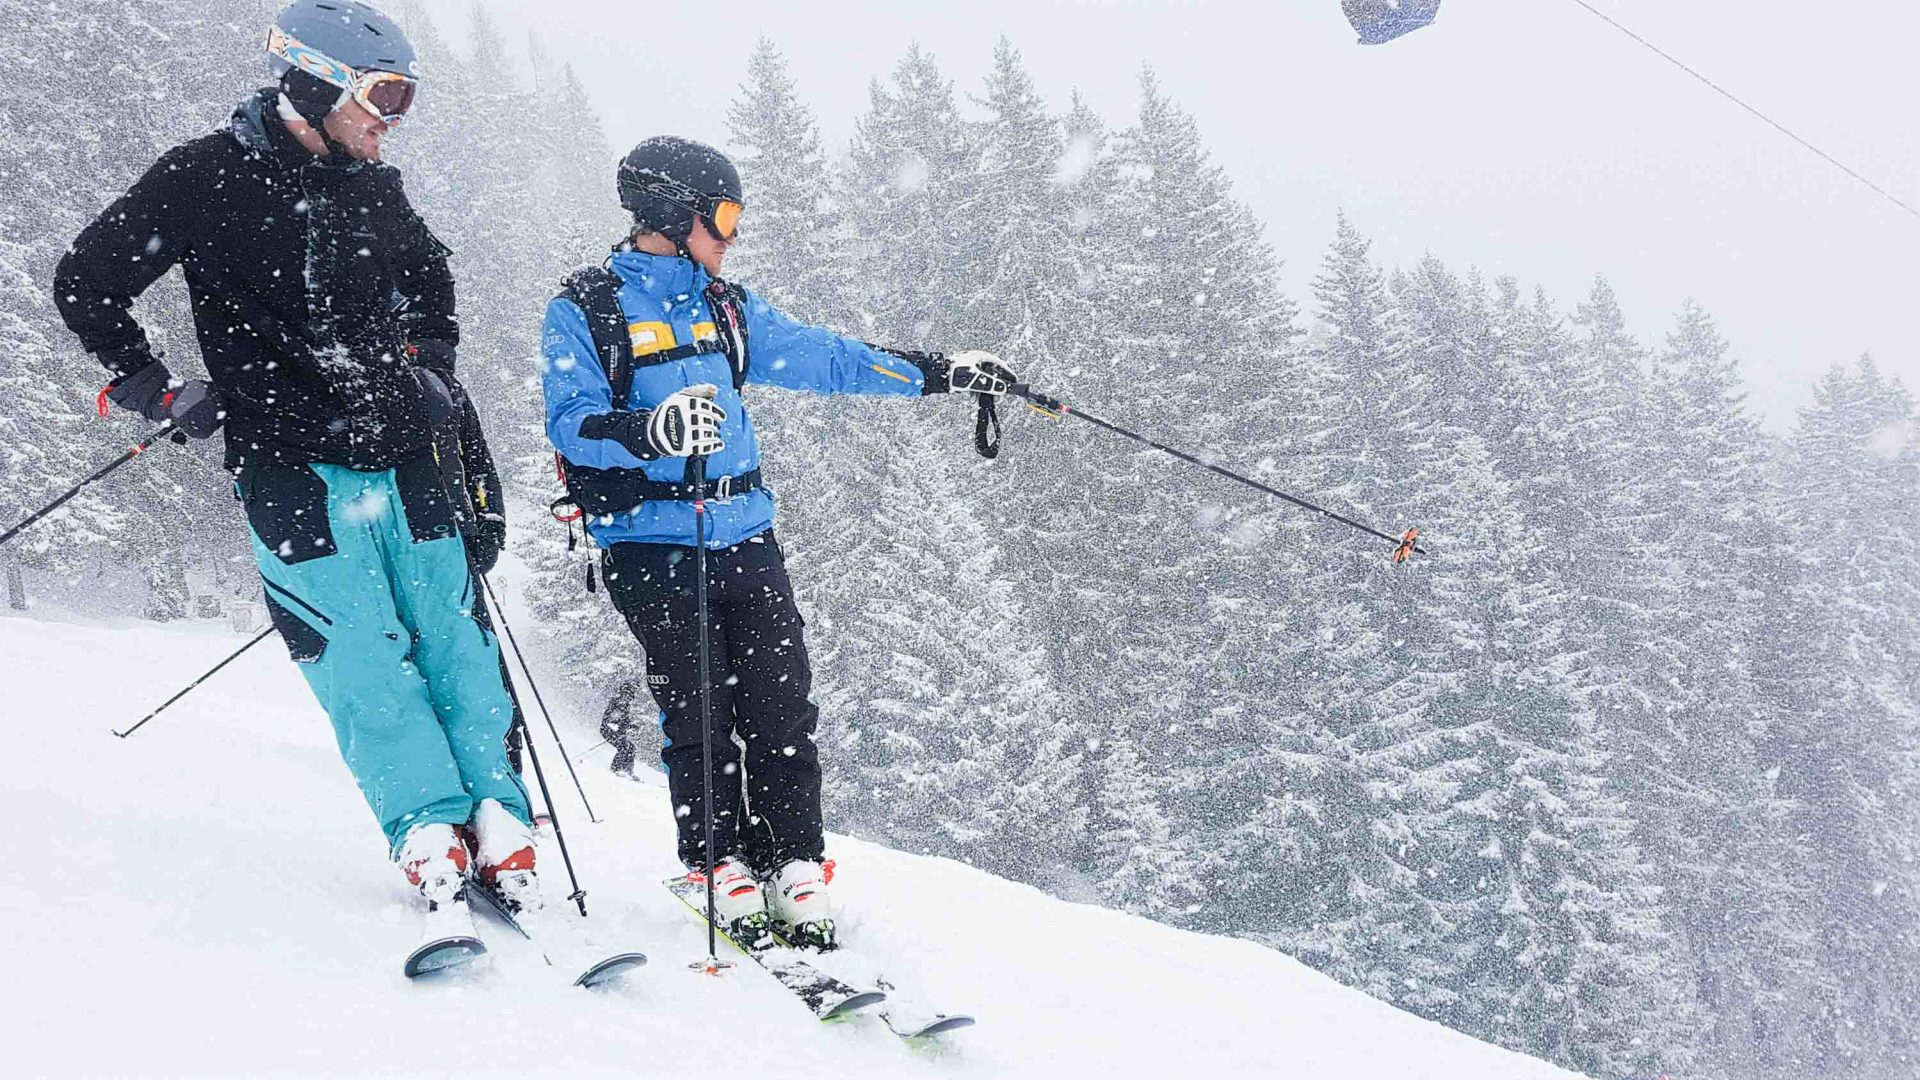 Skiing in St. Anton am Arlberg, Austria.